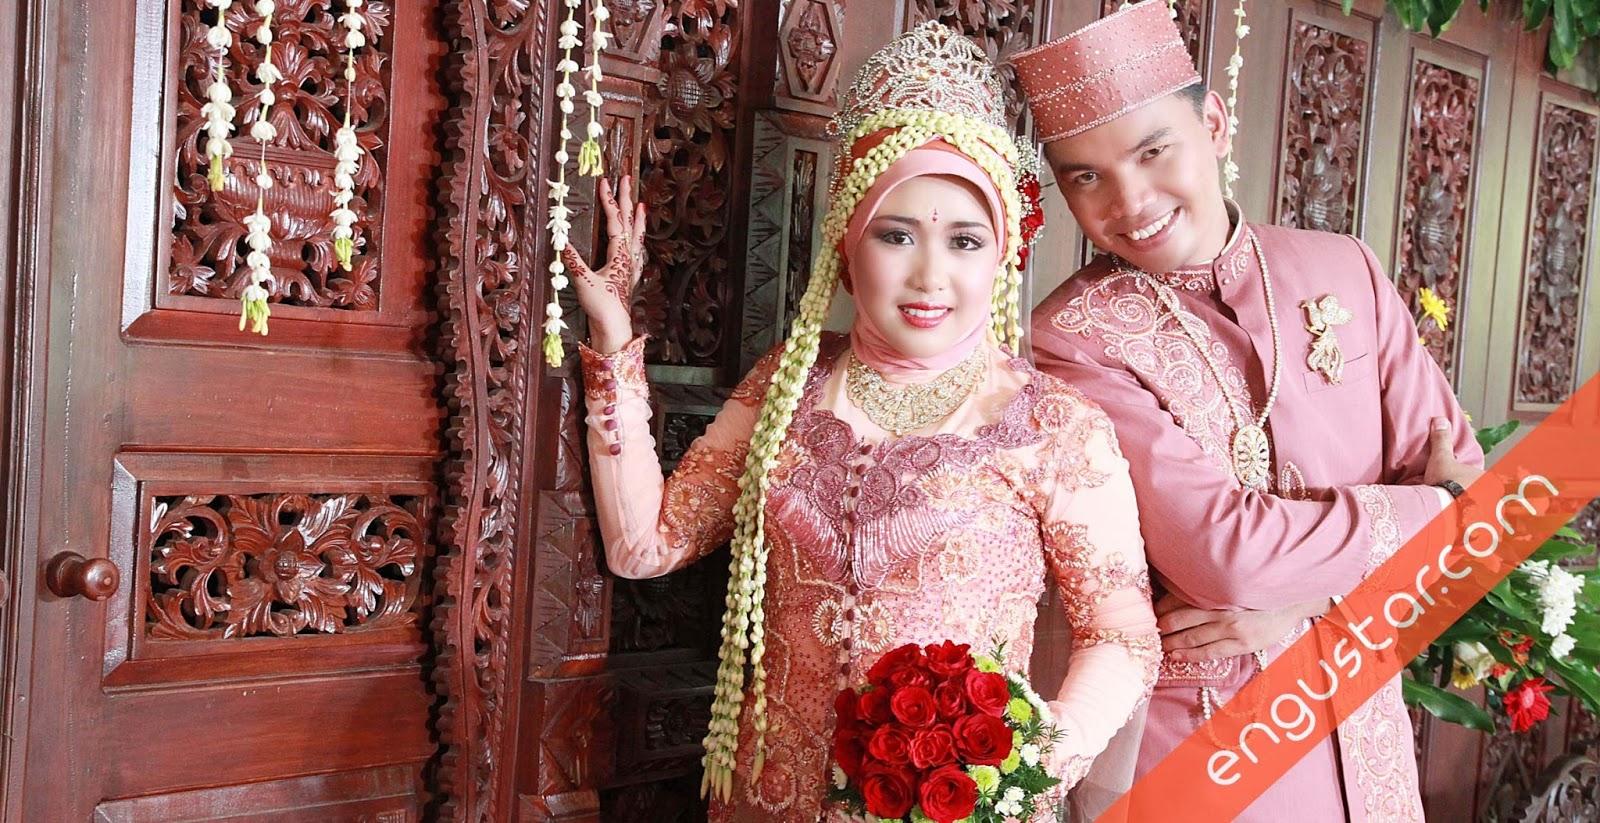 Foto Wedding Dg Dekorasi Pernikahan Outdoor Di Yogyakarta: Foto-foto Pernikahan Purnomo+Widelia Ika Putri @TBS Solo